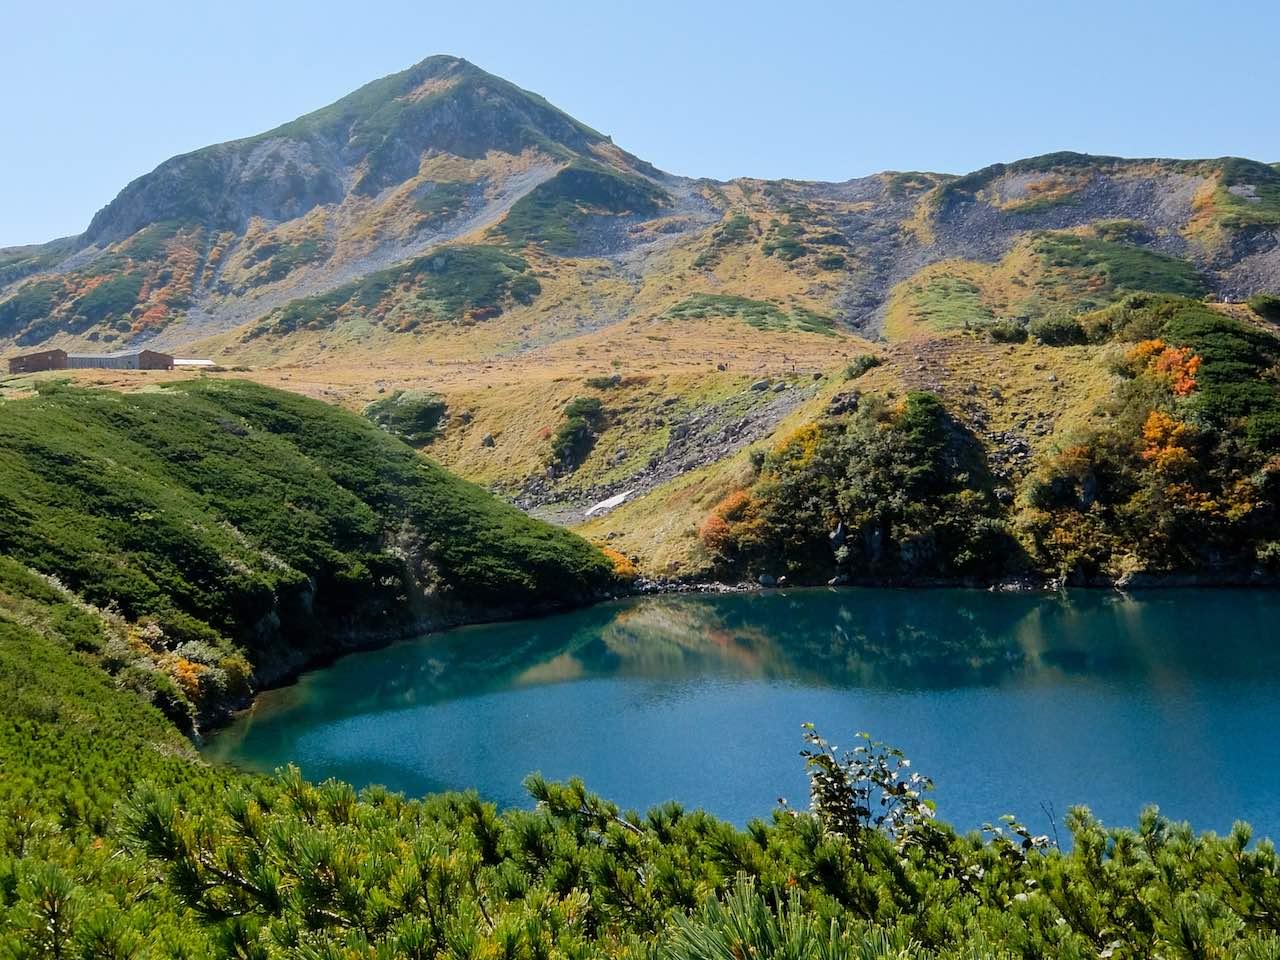 Hiking from Tateyama - Mikurigaike Crater Lake